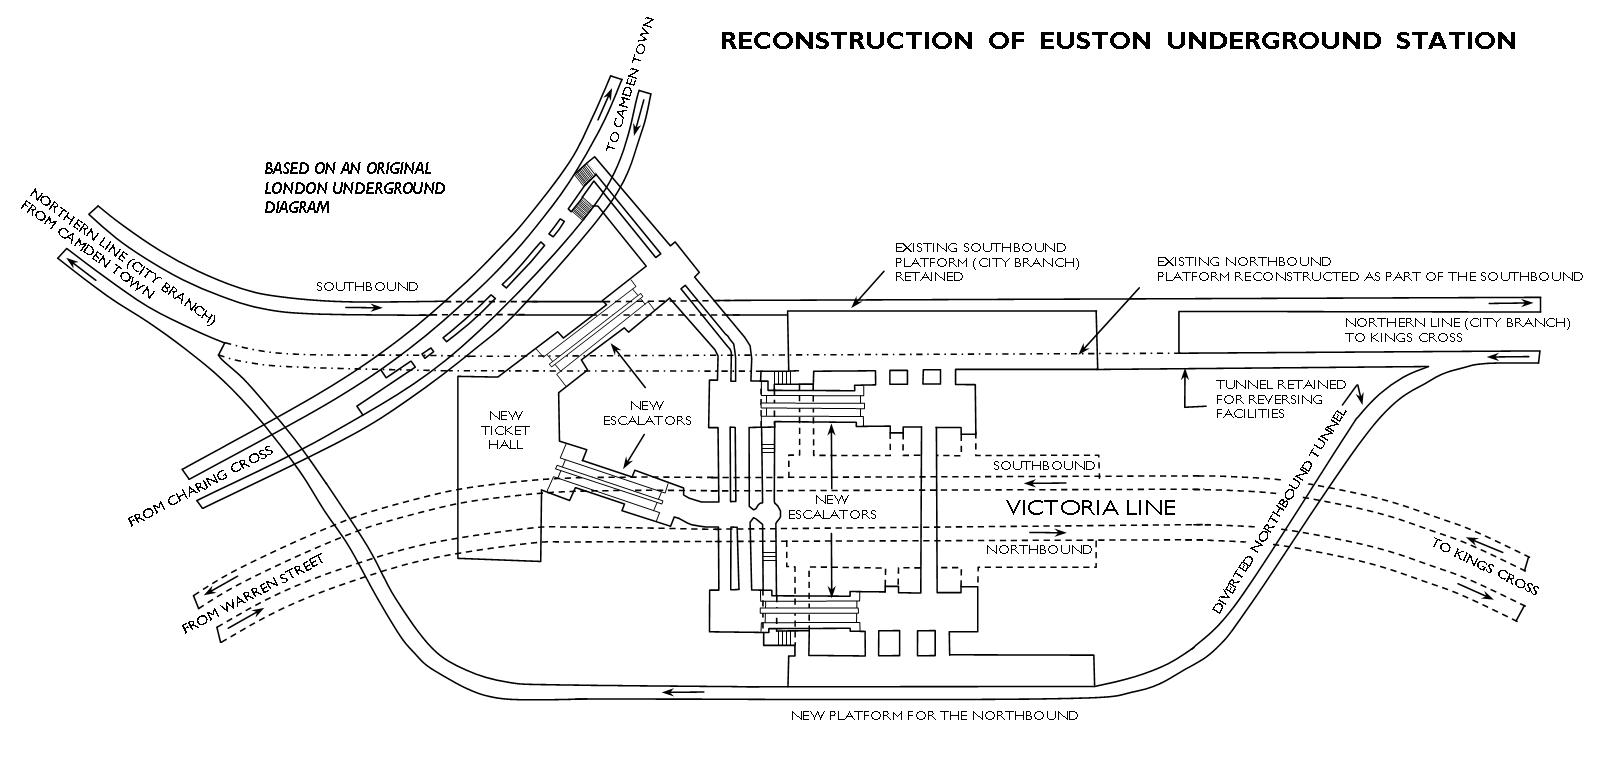 Euston tube station layout - The Victoria Line's really big 50th birthday!